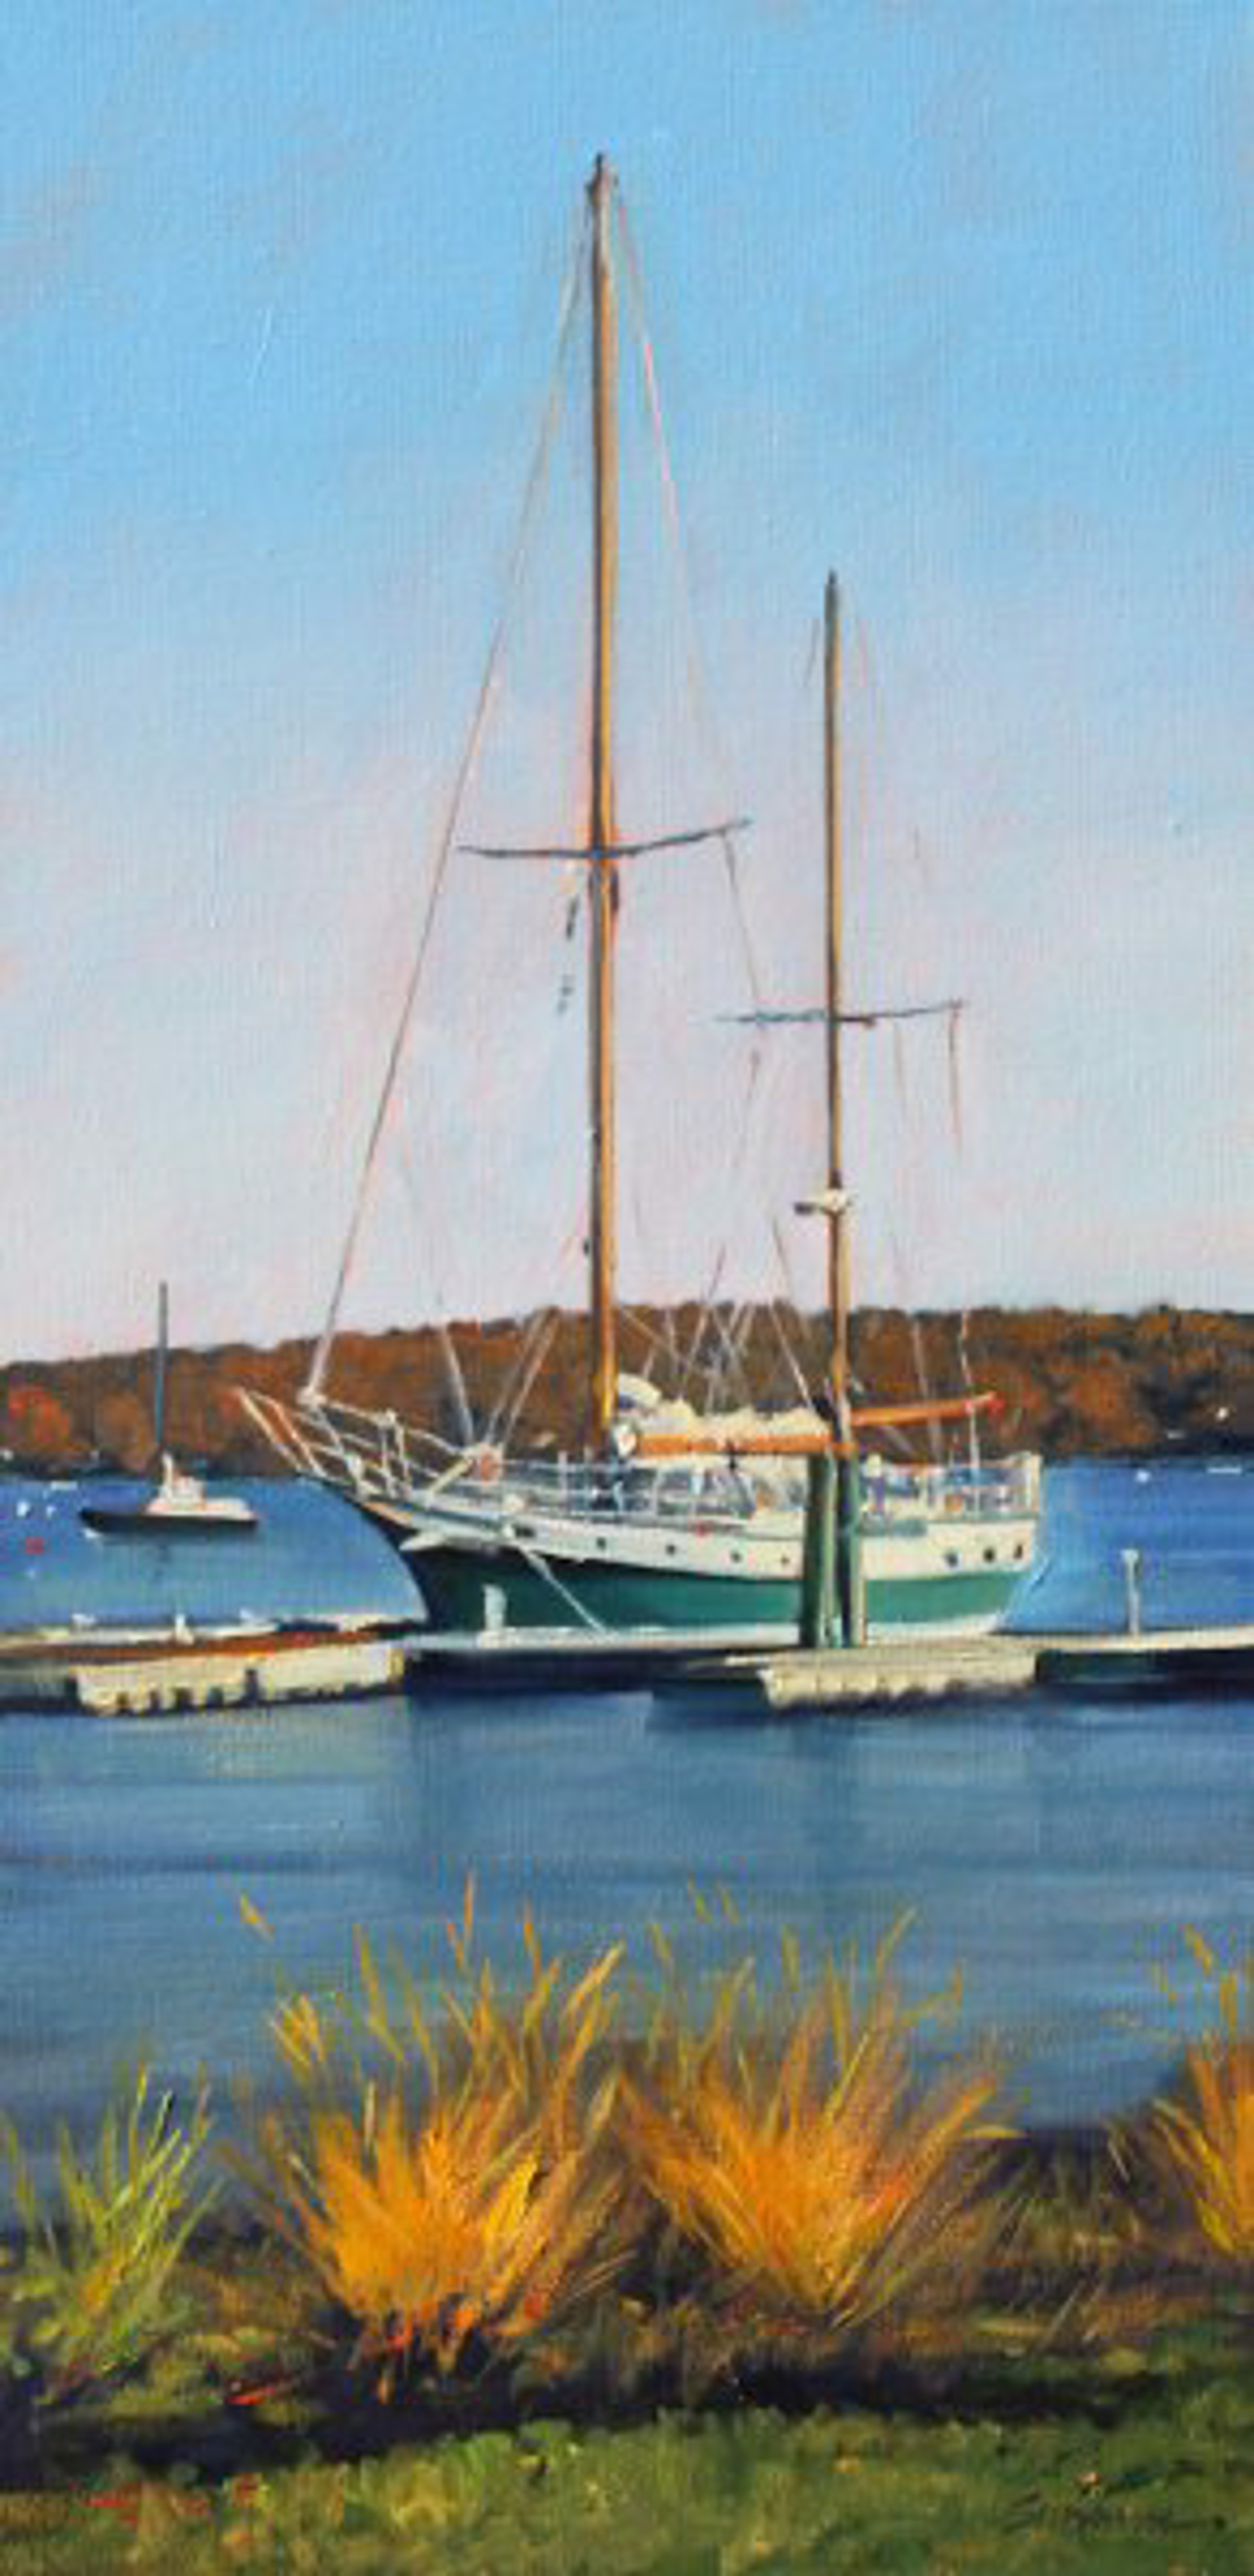 Tom Swimm: Essex Harbor by Tom Swimm